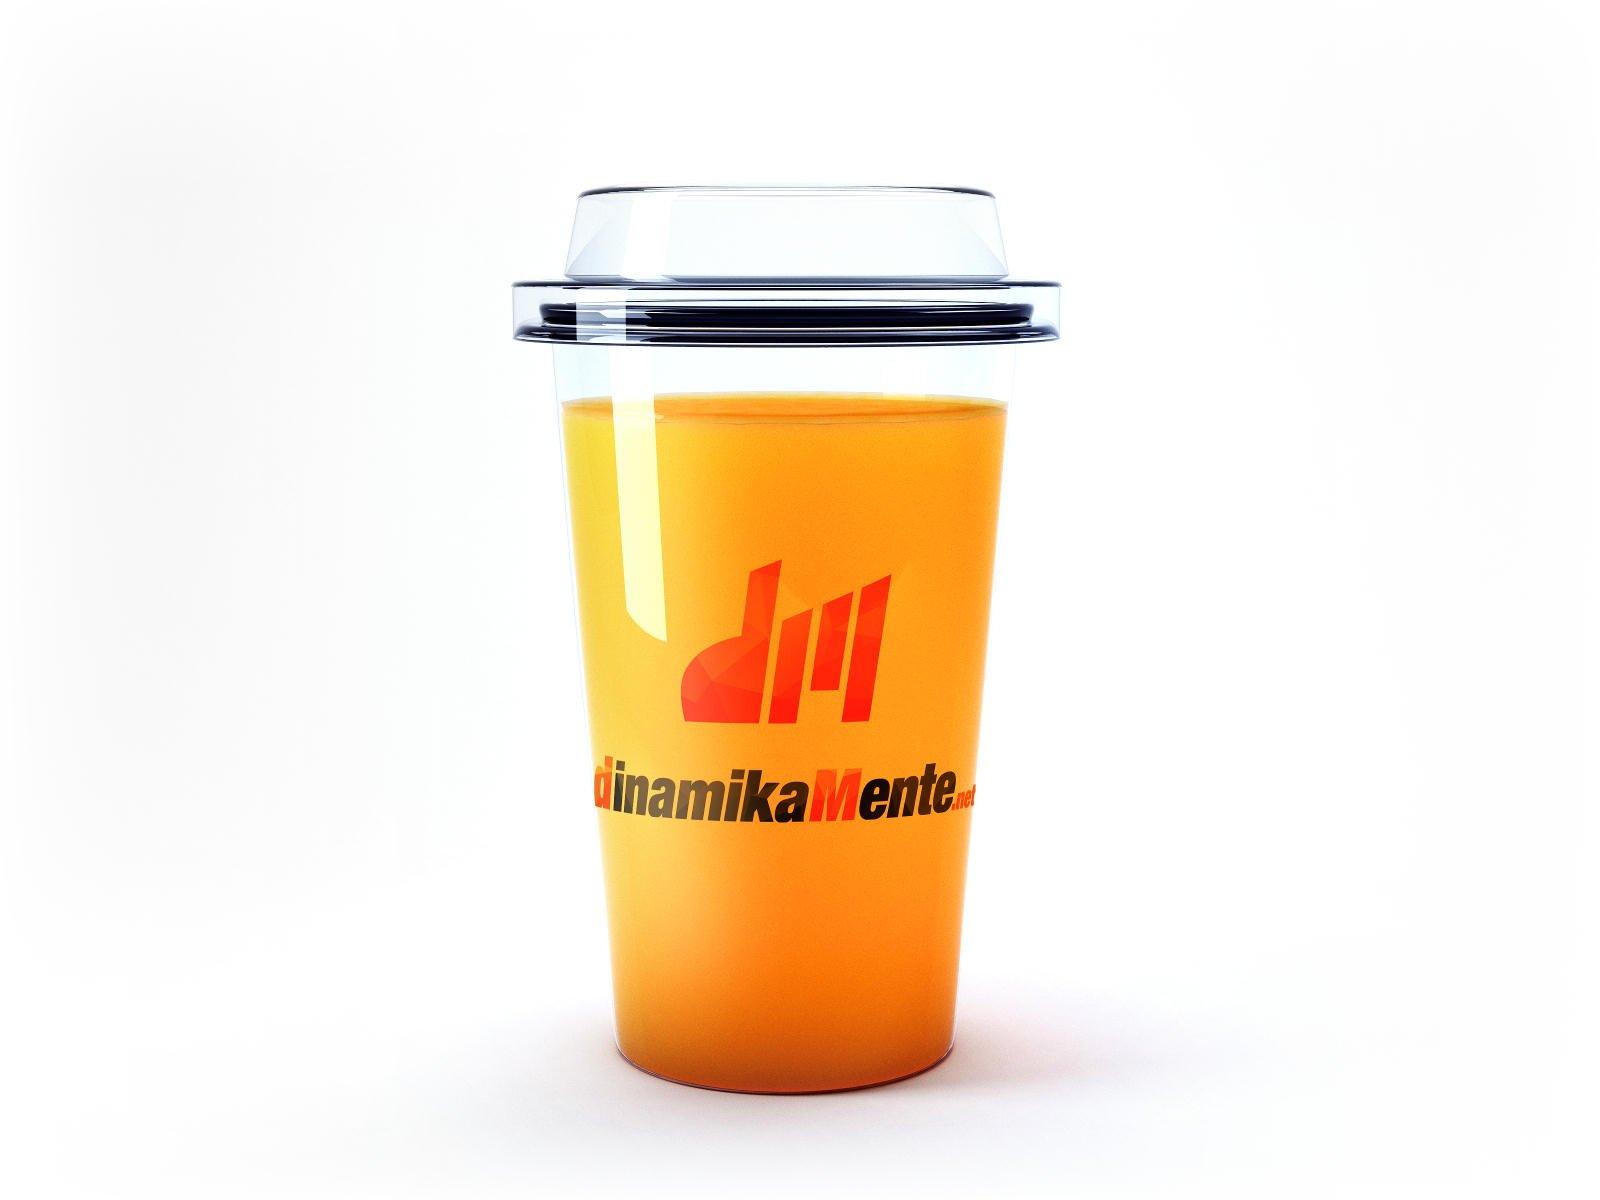 dinamikamente-bicchiere-aranciata-web-2